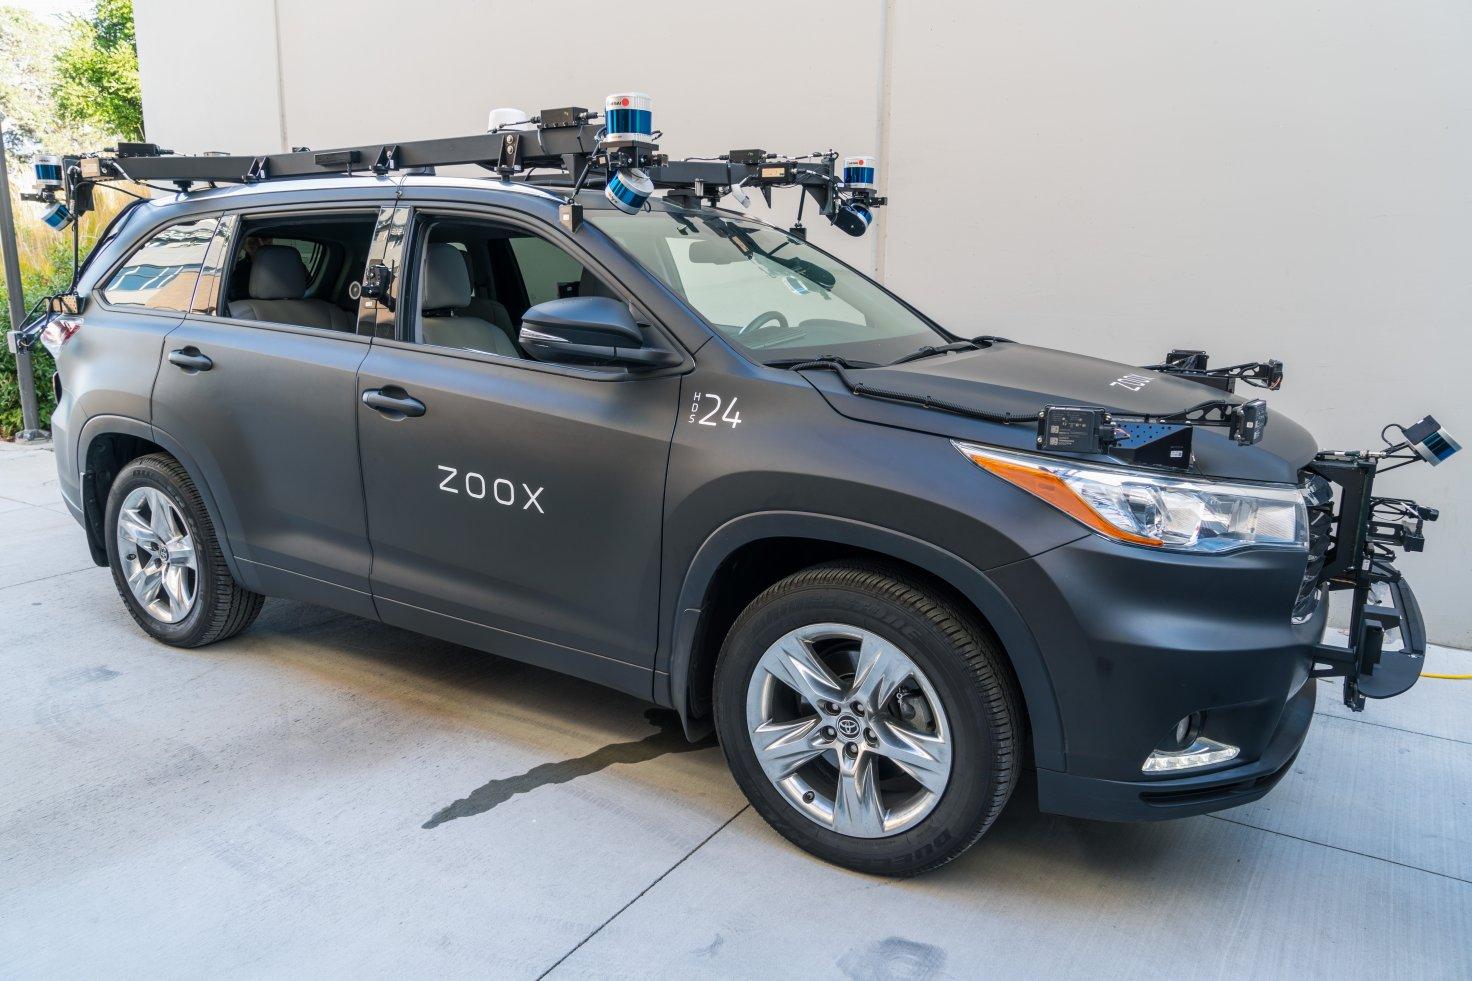 Amazon Buying Self-Driving Car Start-Up Zoox